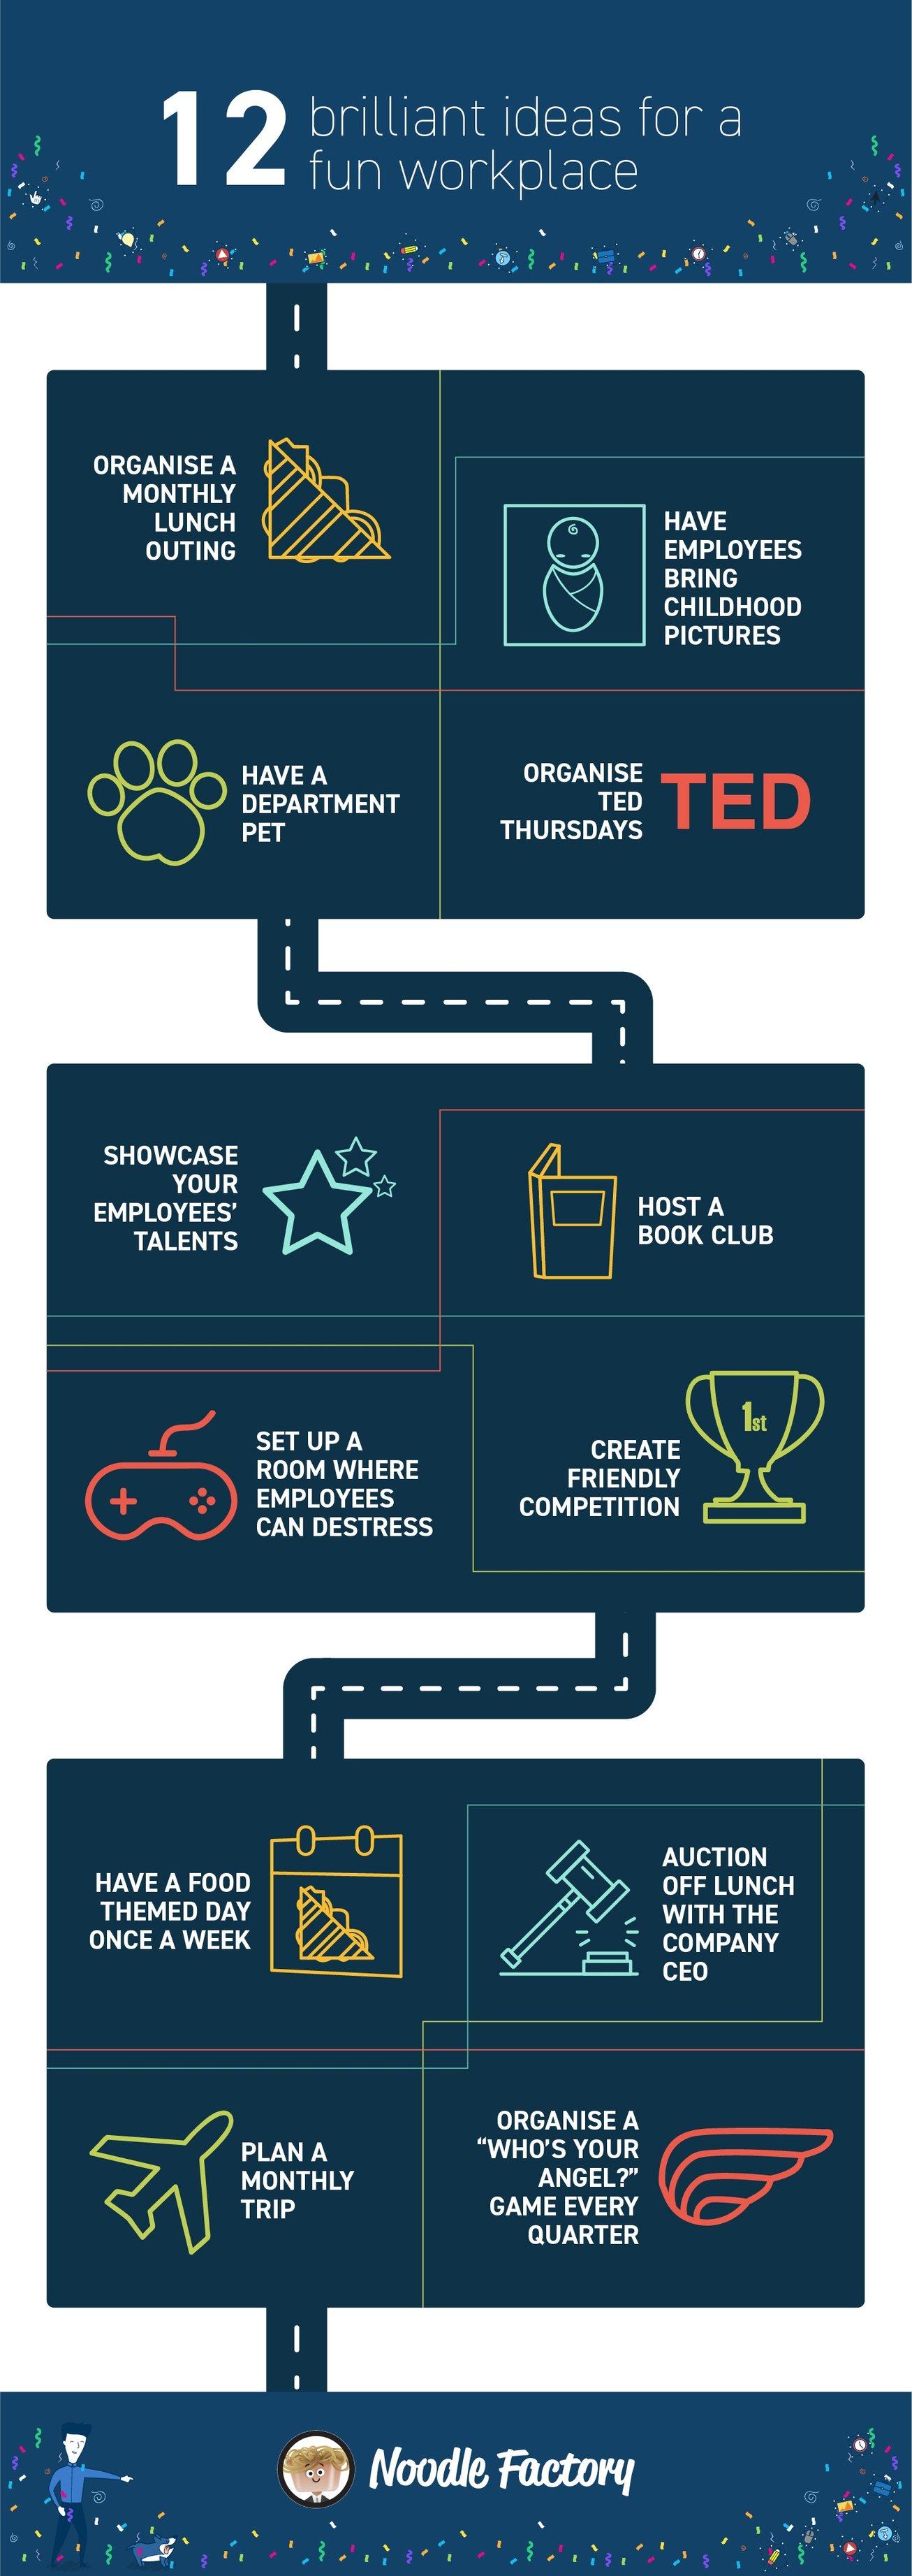 12-brilliant-ideas-infographic-2.jpg